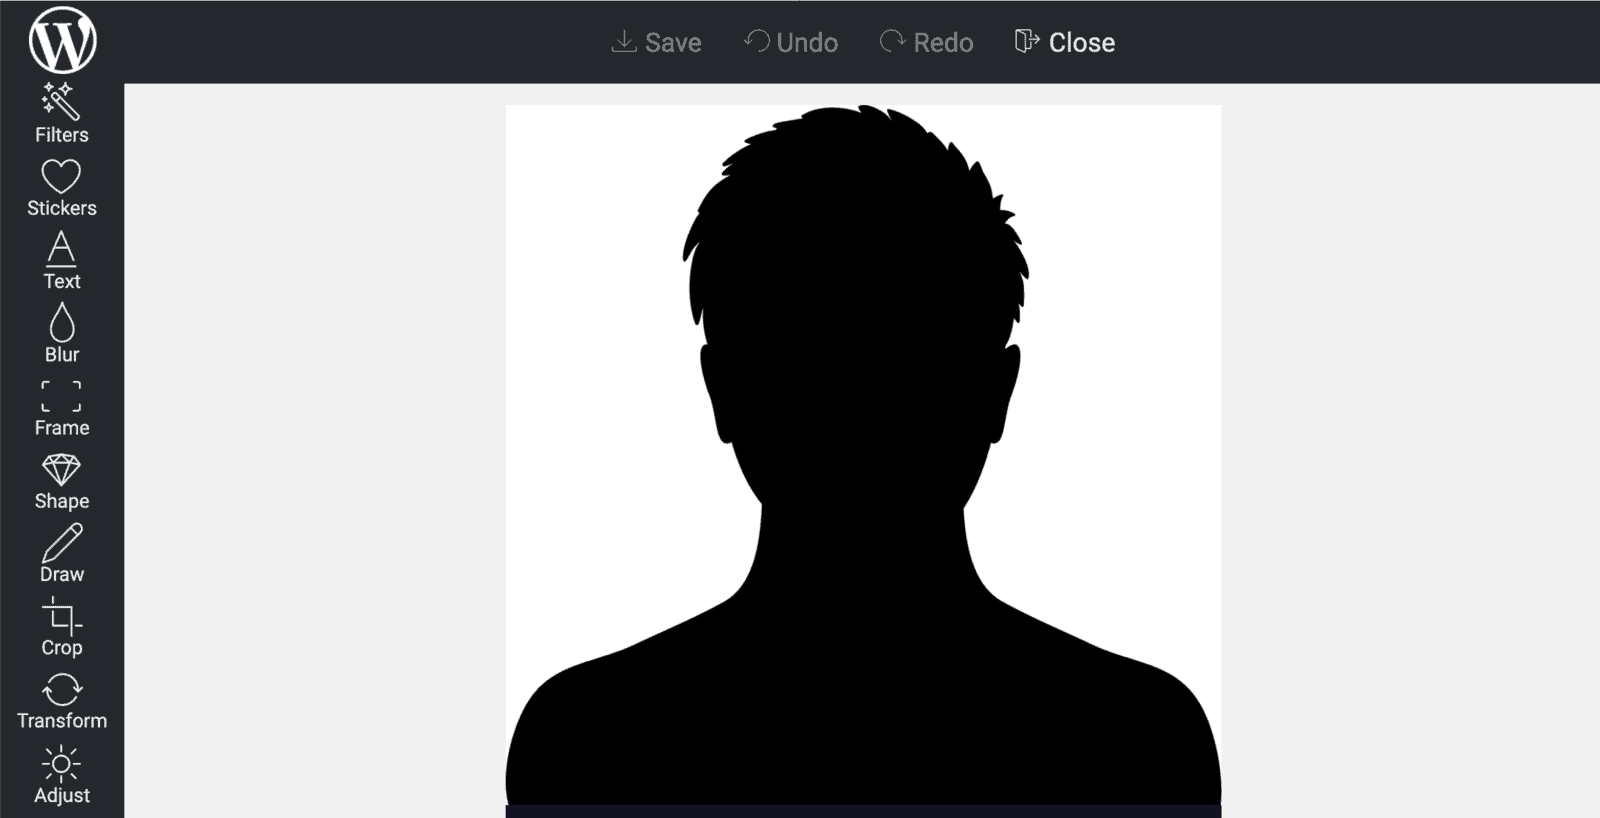 Image editor dashboard